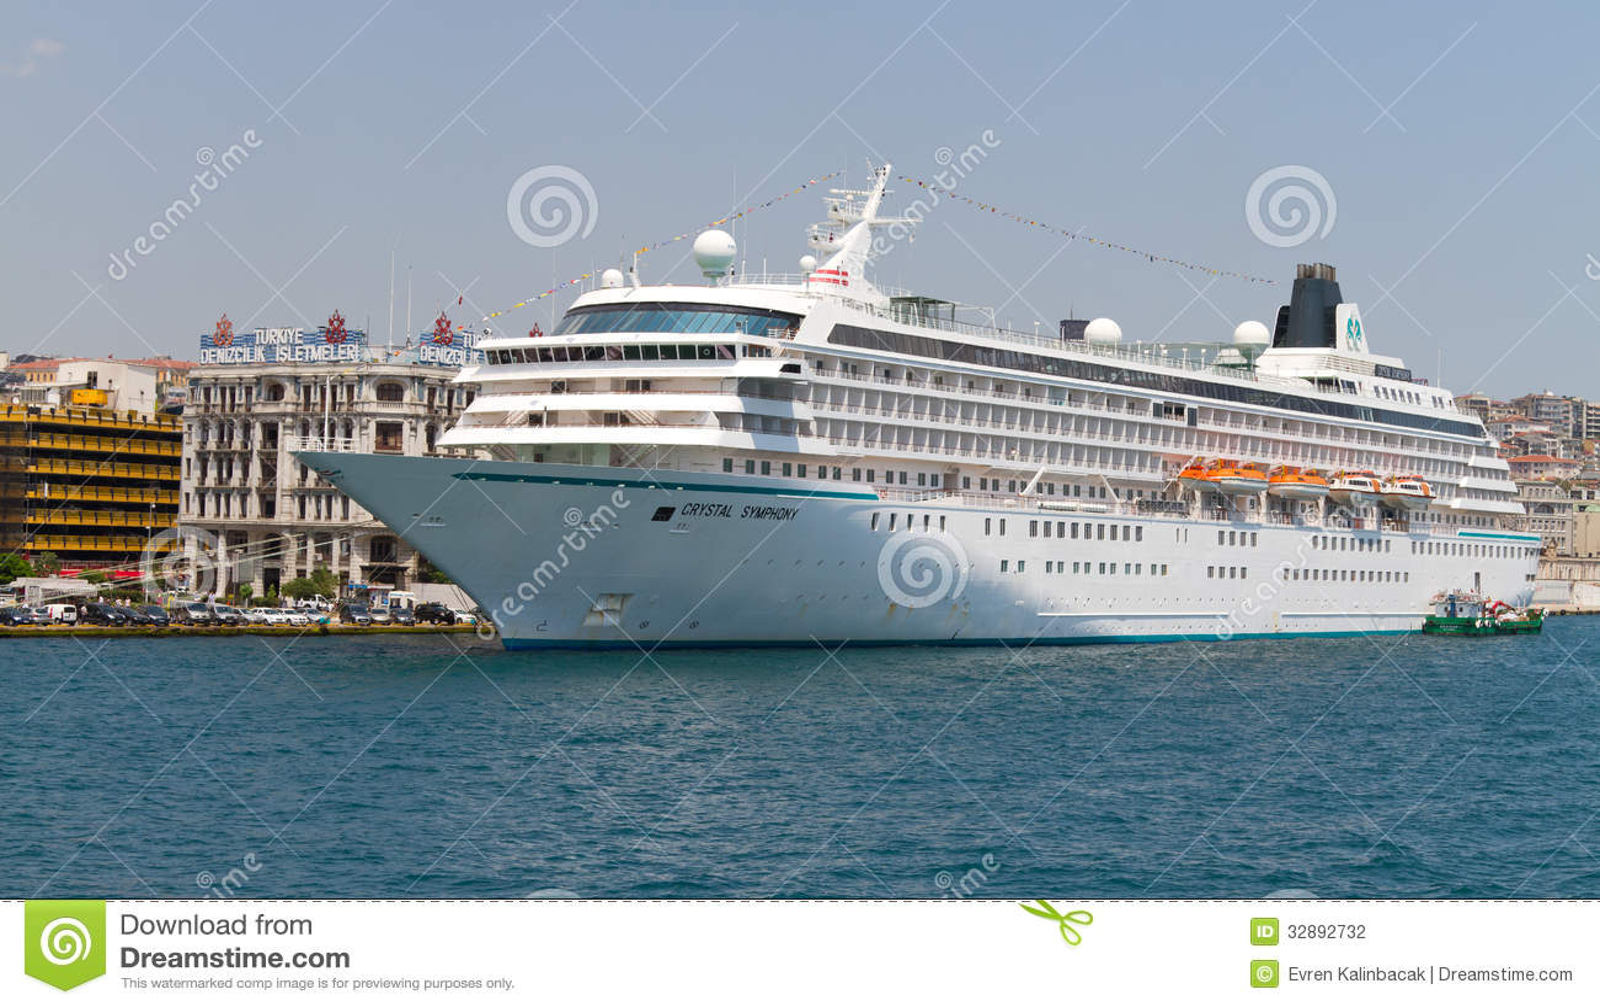 Cruise Ship Editorial Photography  Image 32892732